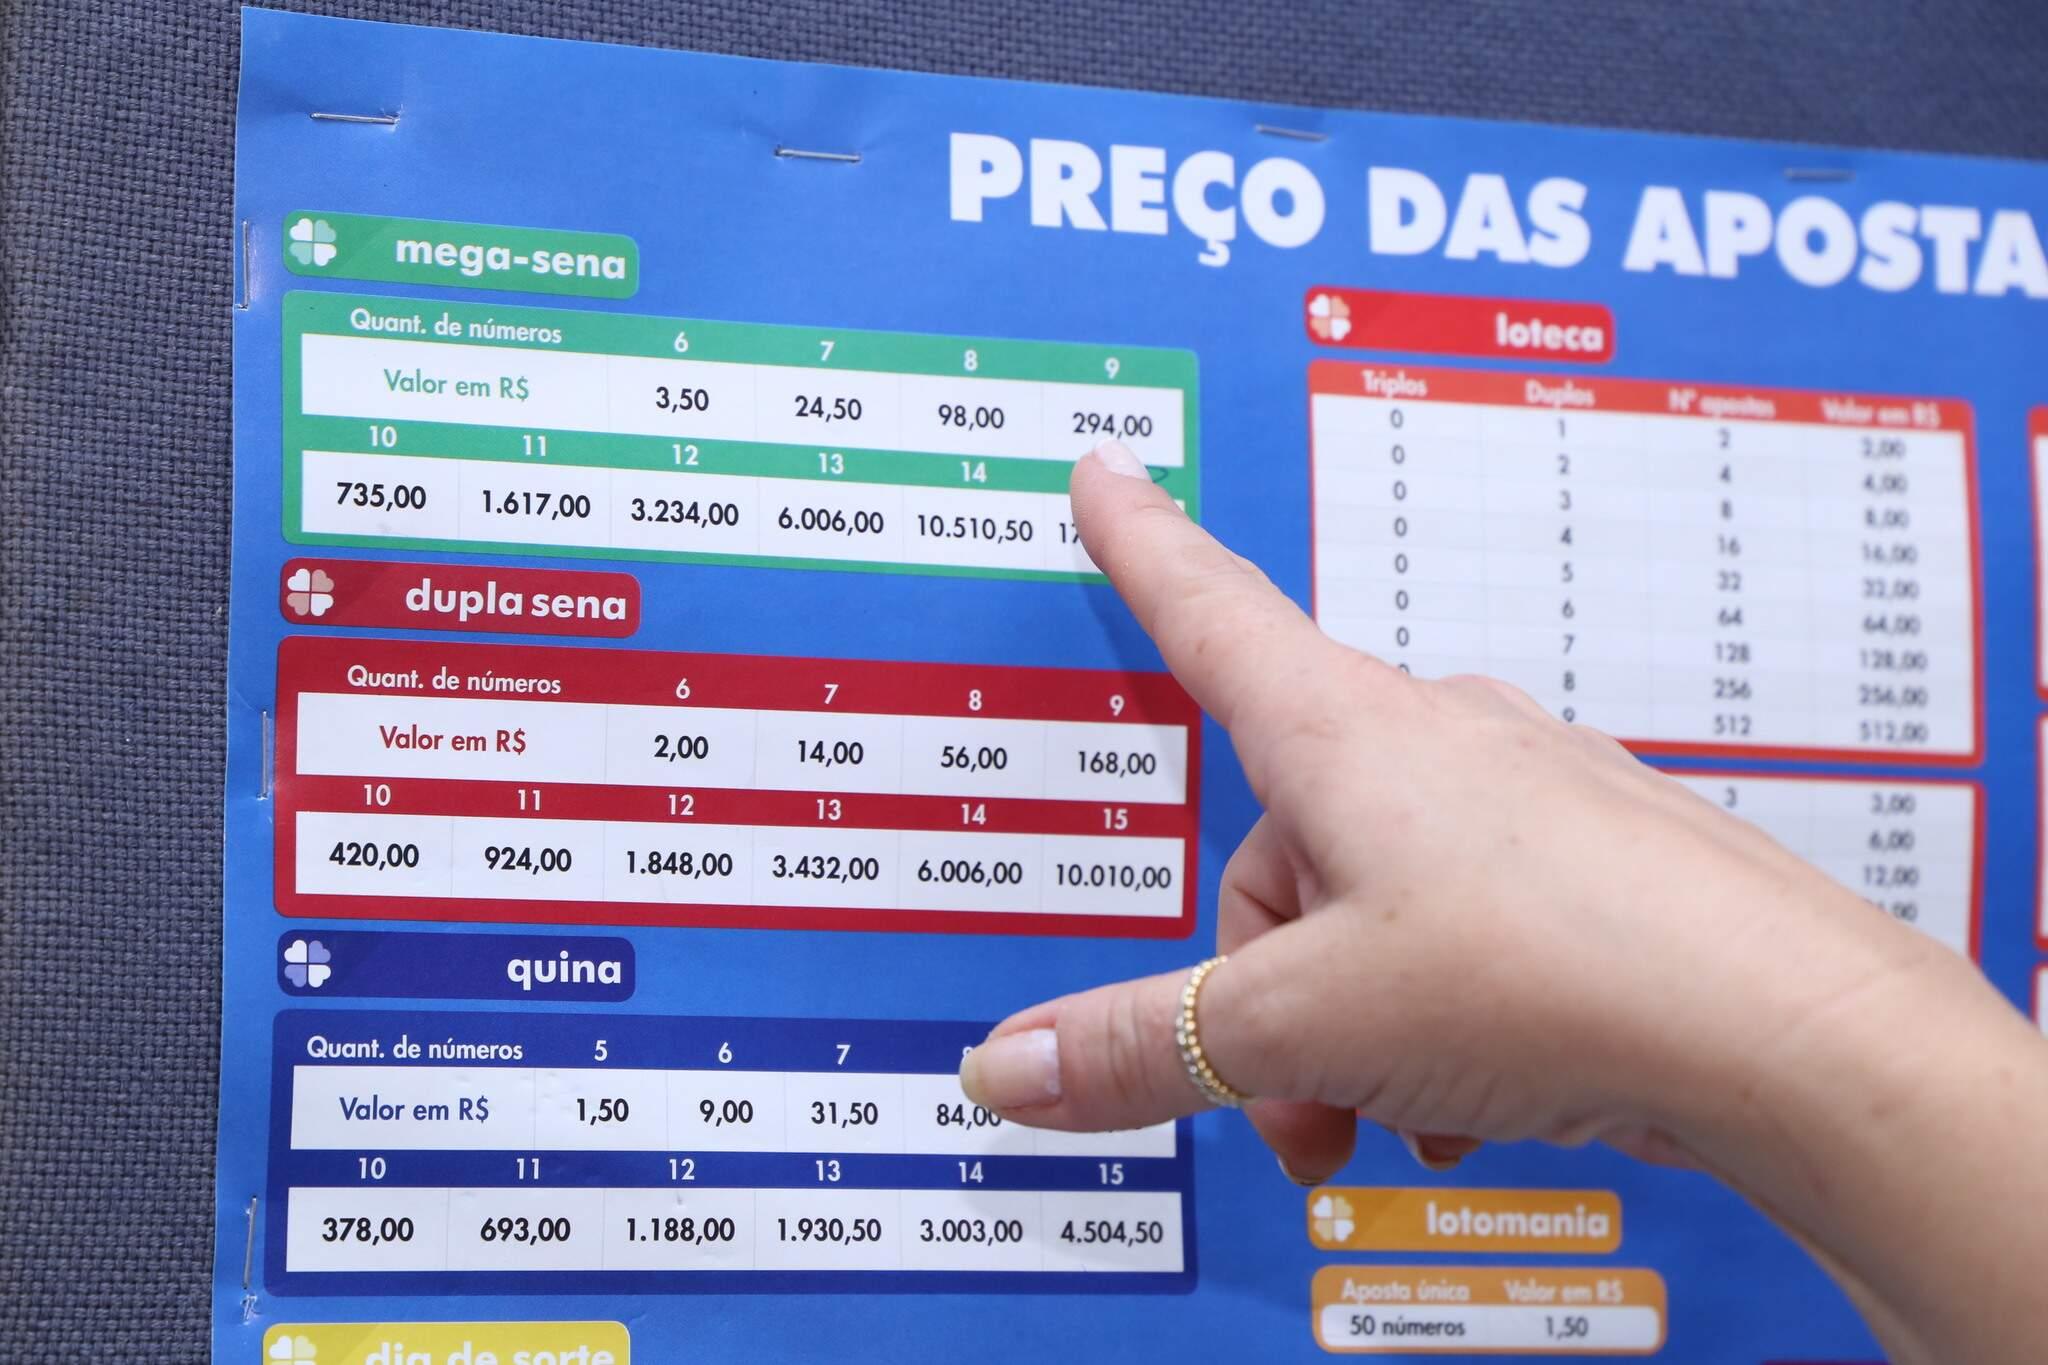 Apostadora apontando os valores das apostas da Mega-Sena. (Foto: Kísie Ainoã)